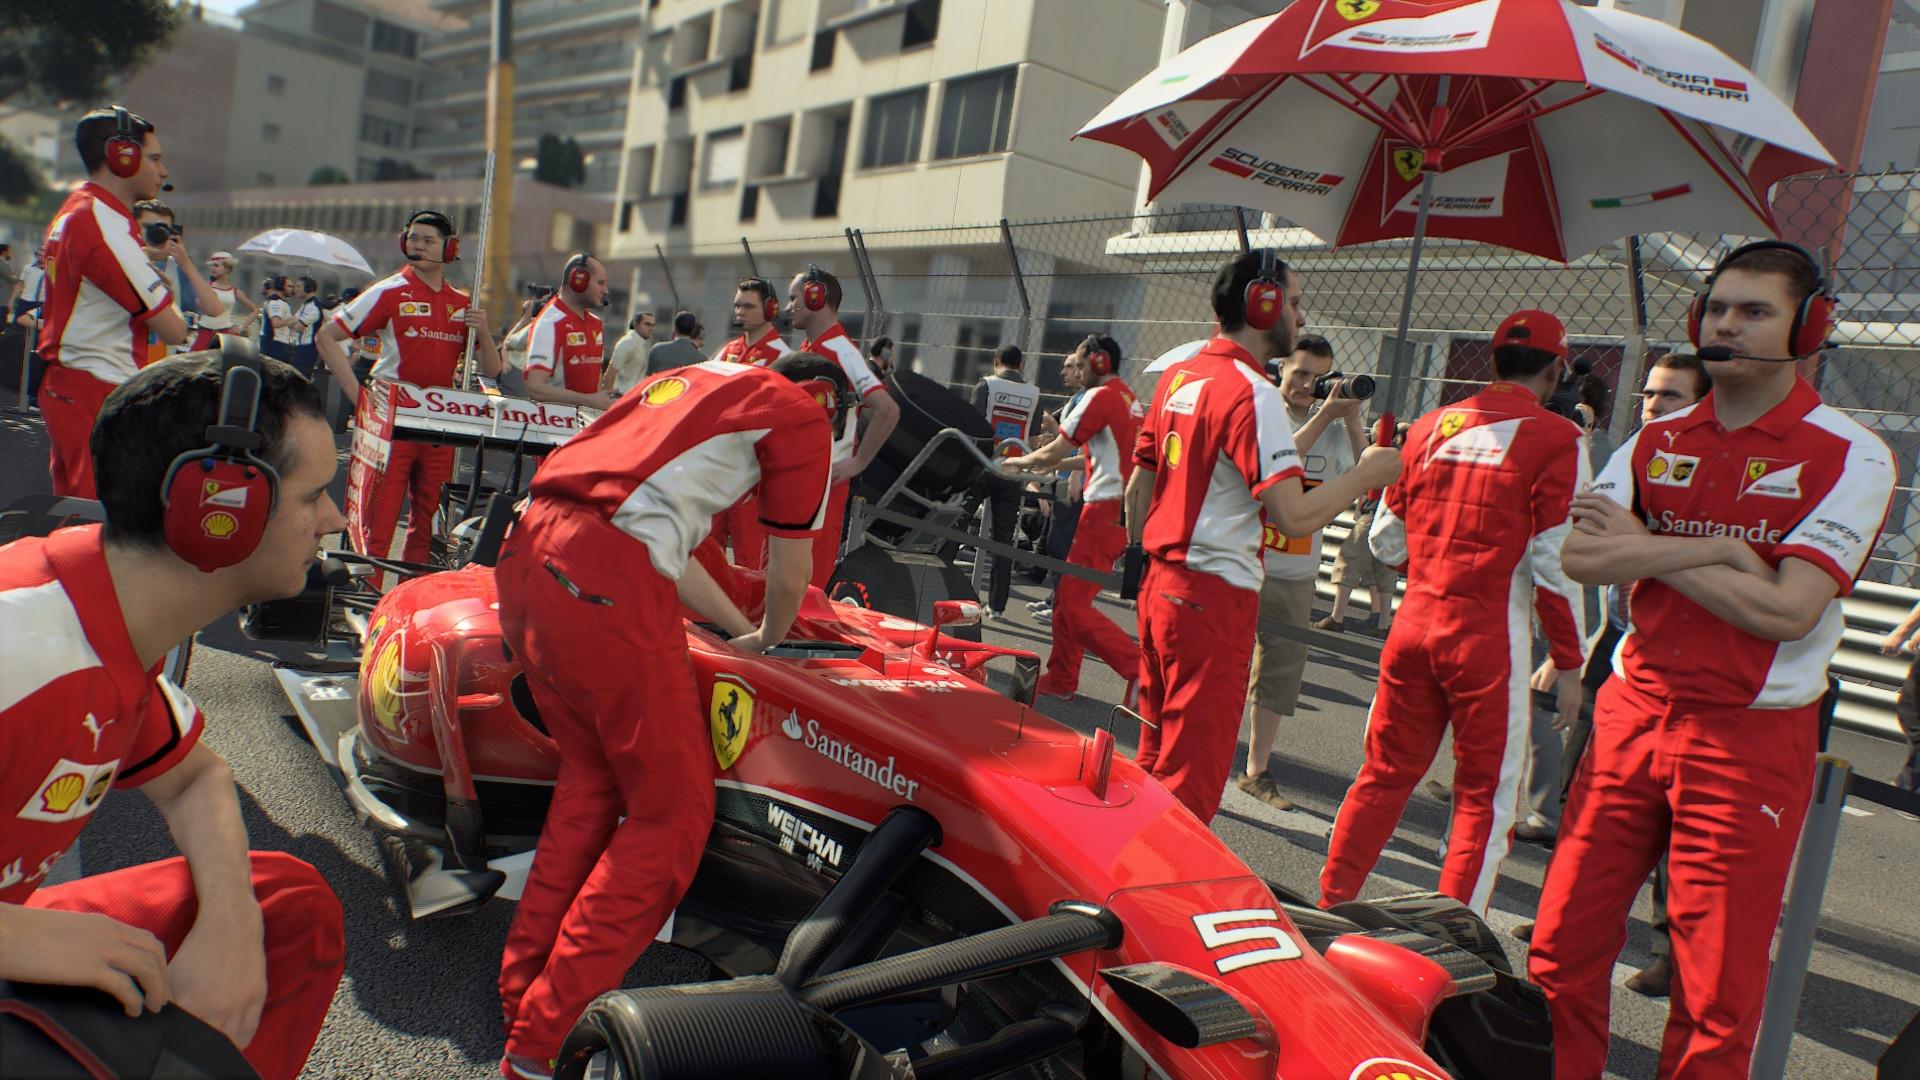 F1 2015 ESPAÑOL PC Full (CPY) + UPDATE v1.0.19.5154 + REPACK 2 DVD5 (JPW) 2